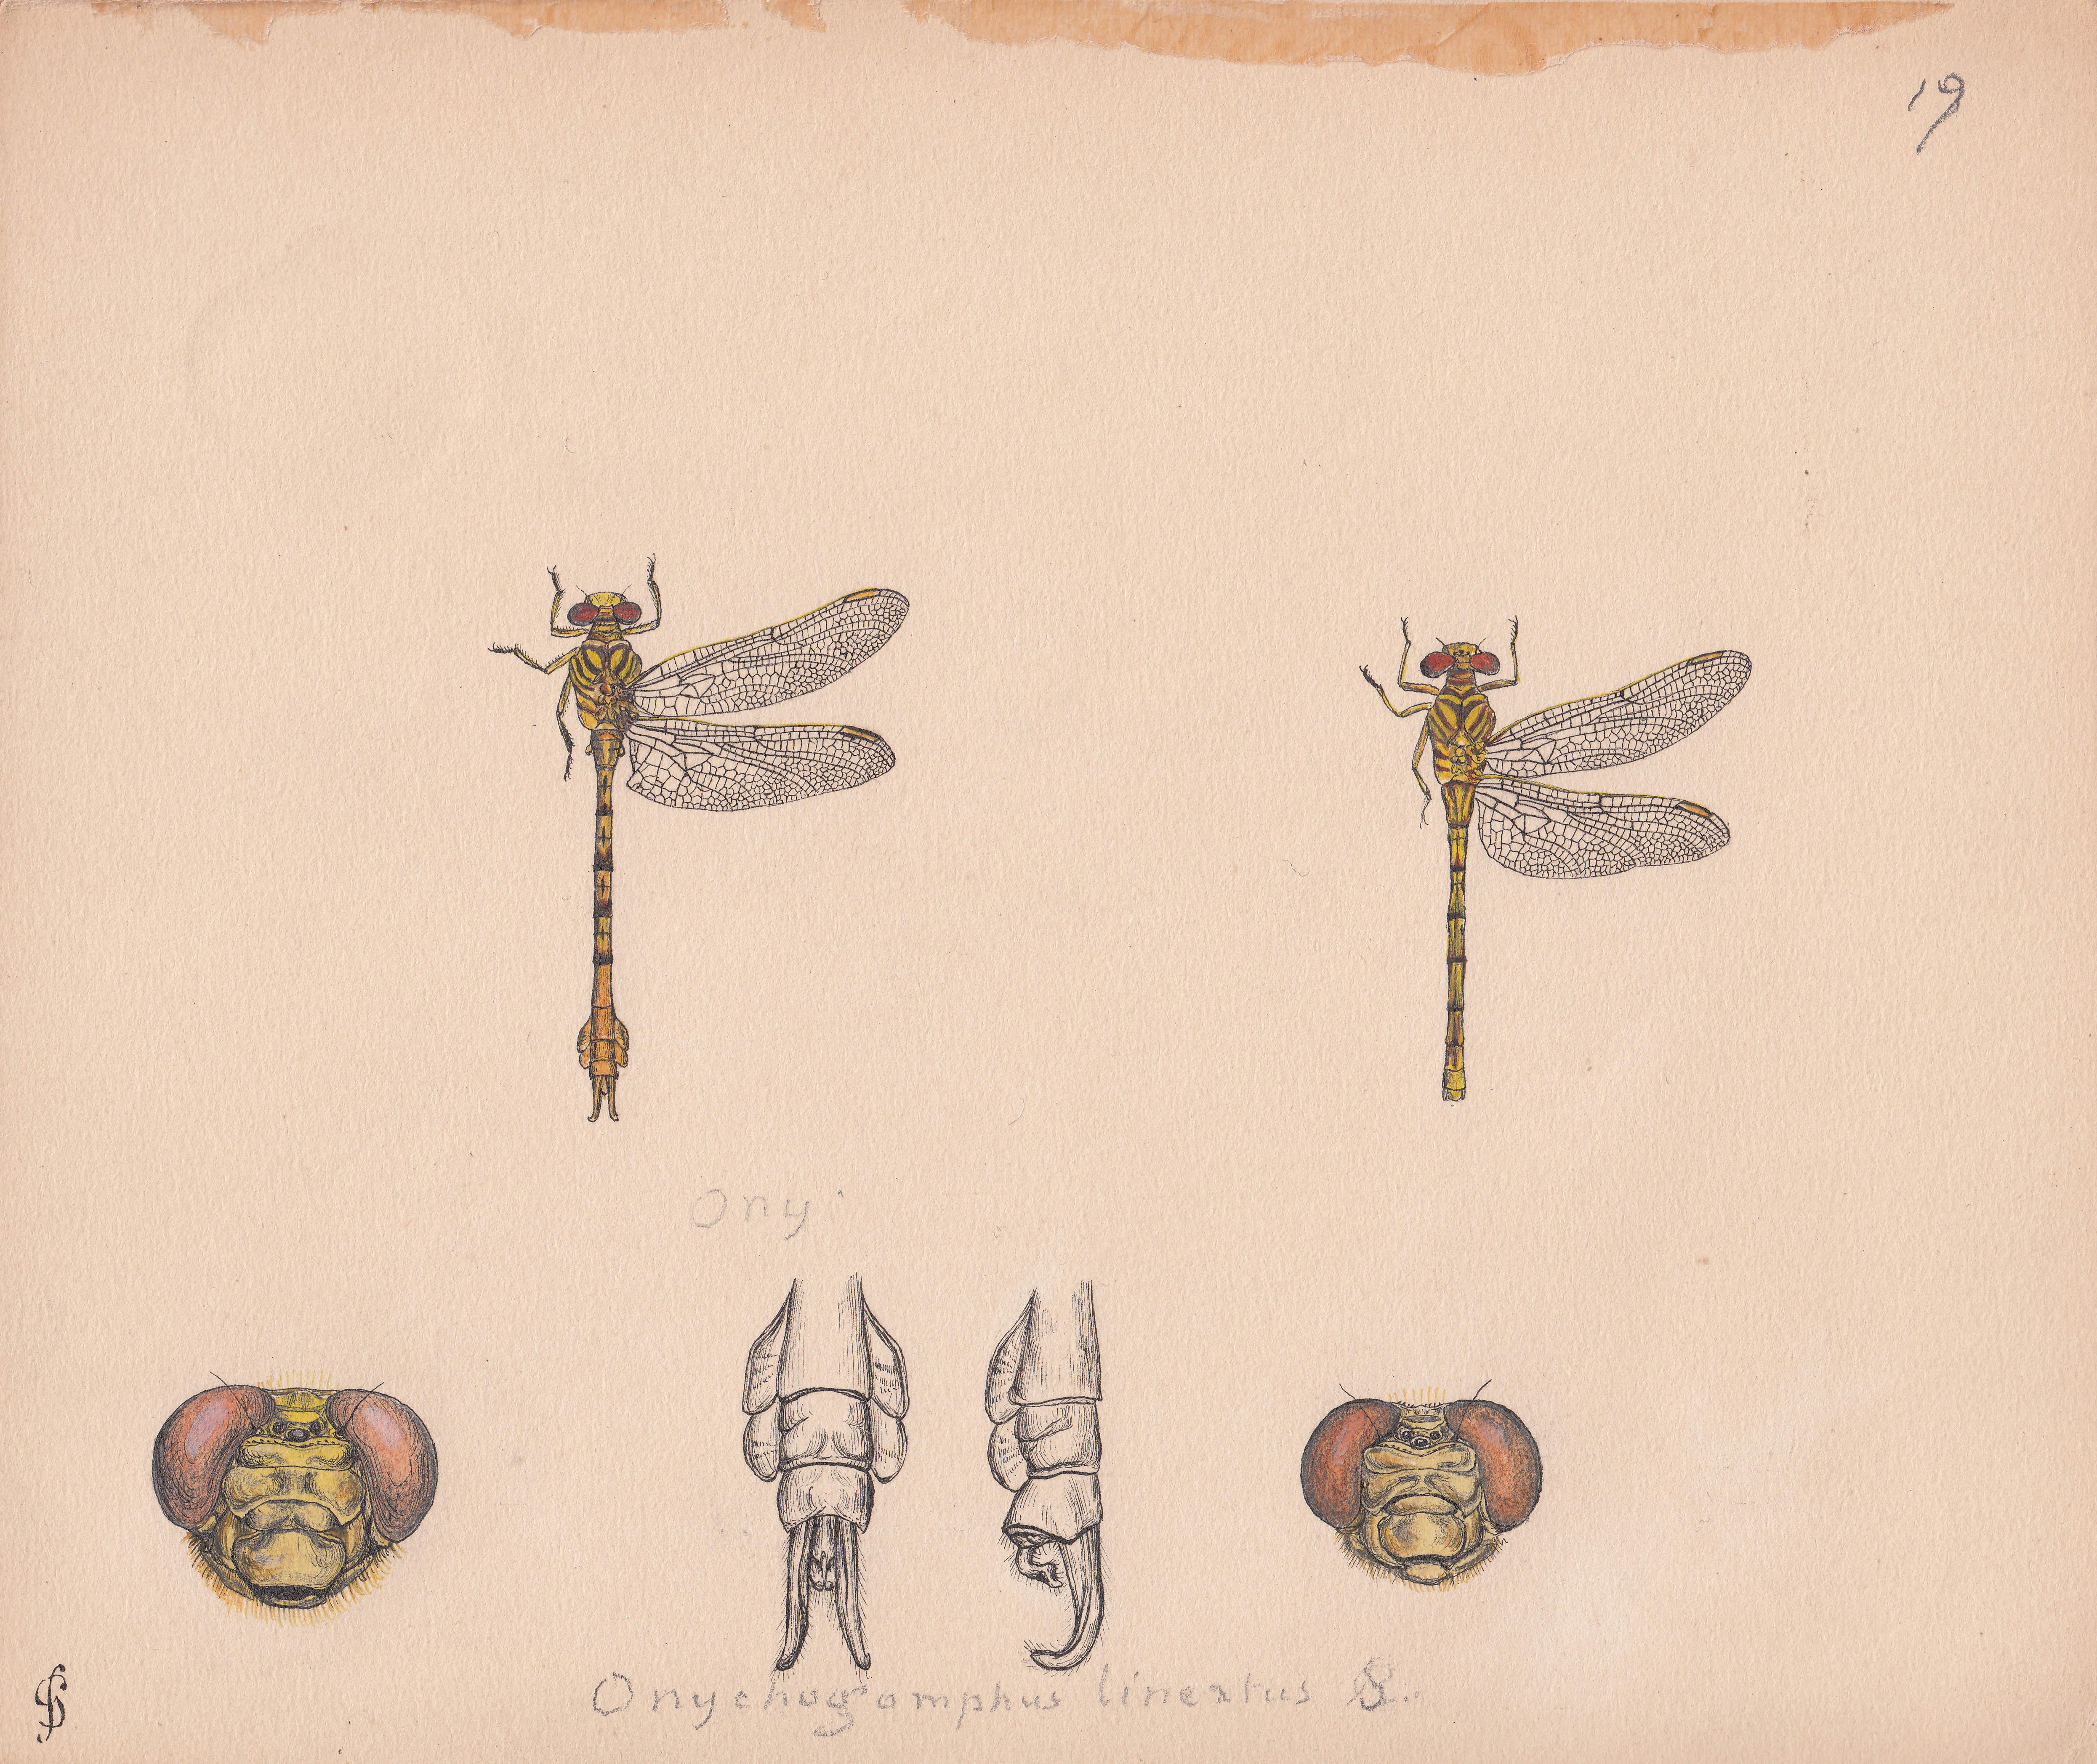 Onychogomphus lineatus.jpg